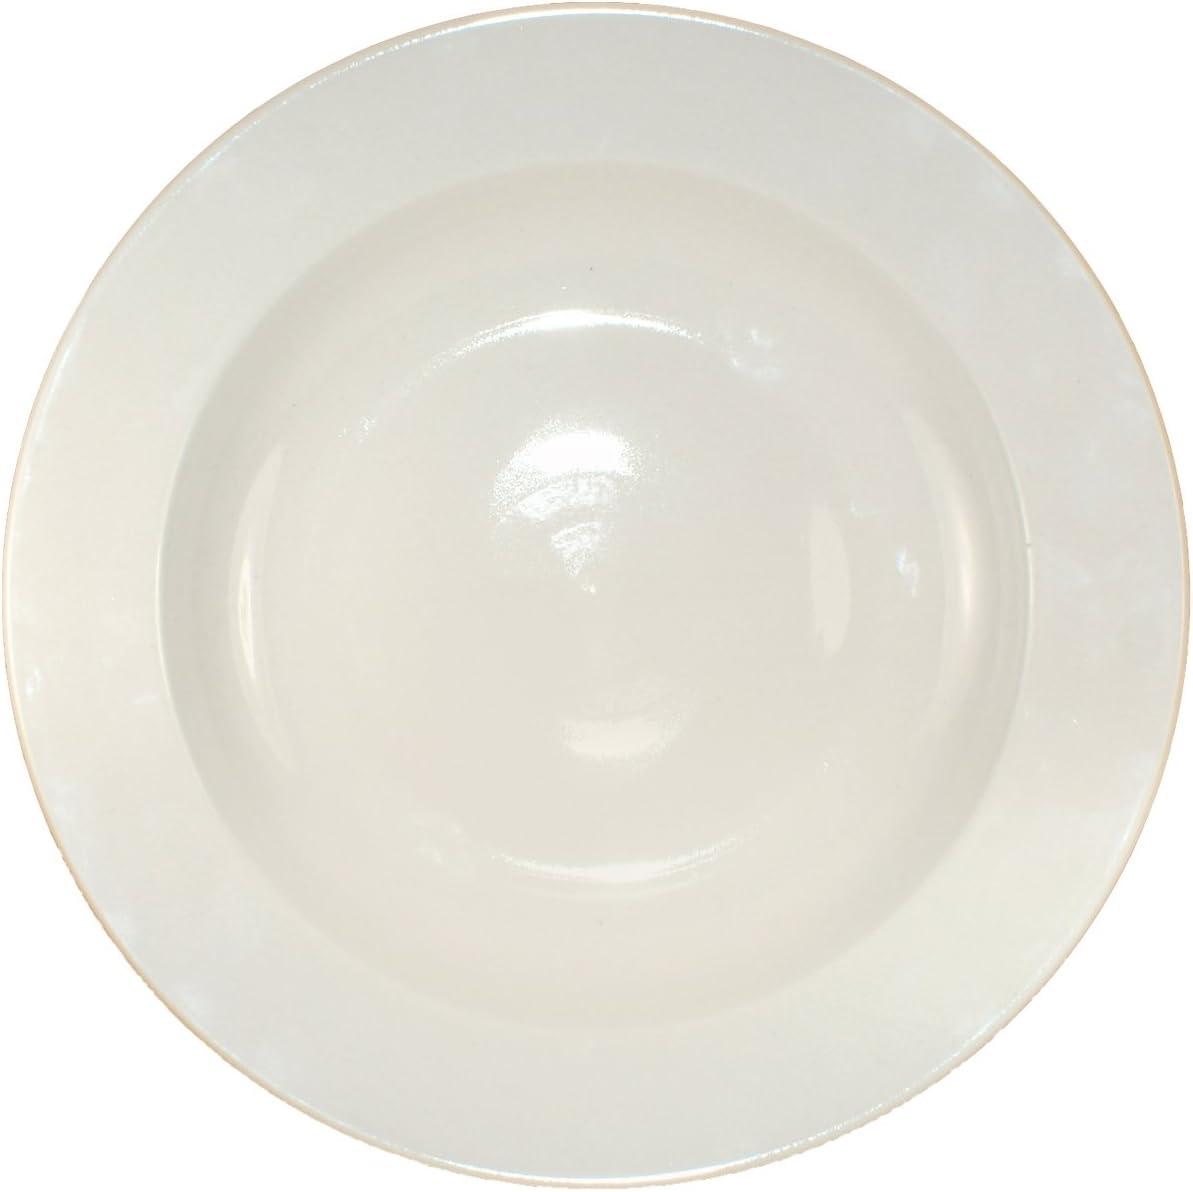 ITI-RO-115 Roma 11-1 2-Inch Pasta Ounce 26 Bowl Max 62% OFF price 12-Piece Amer